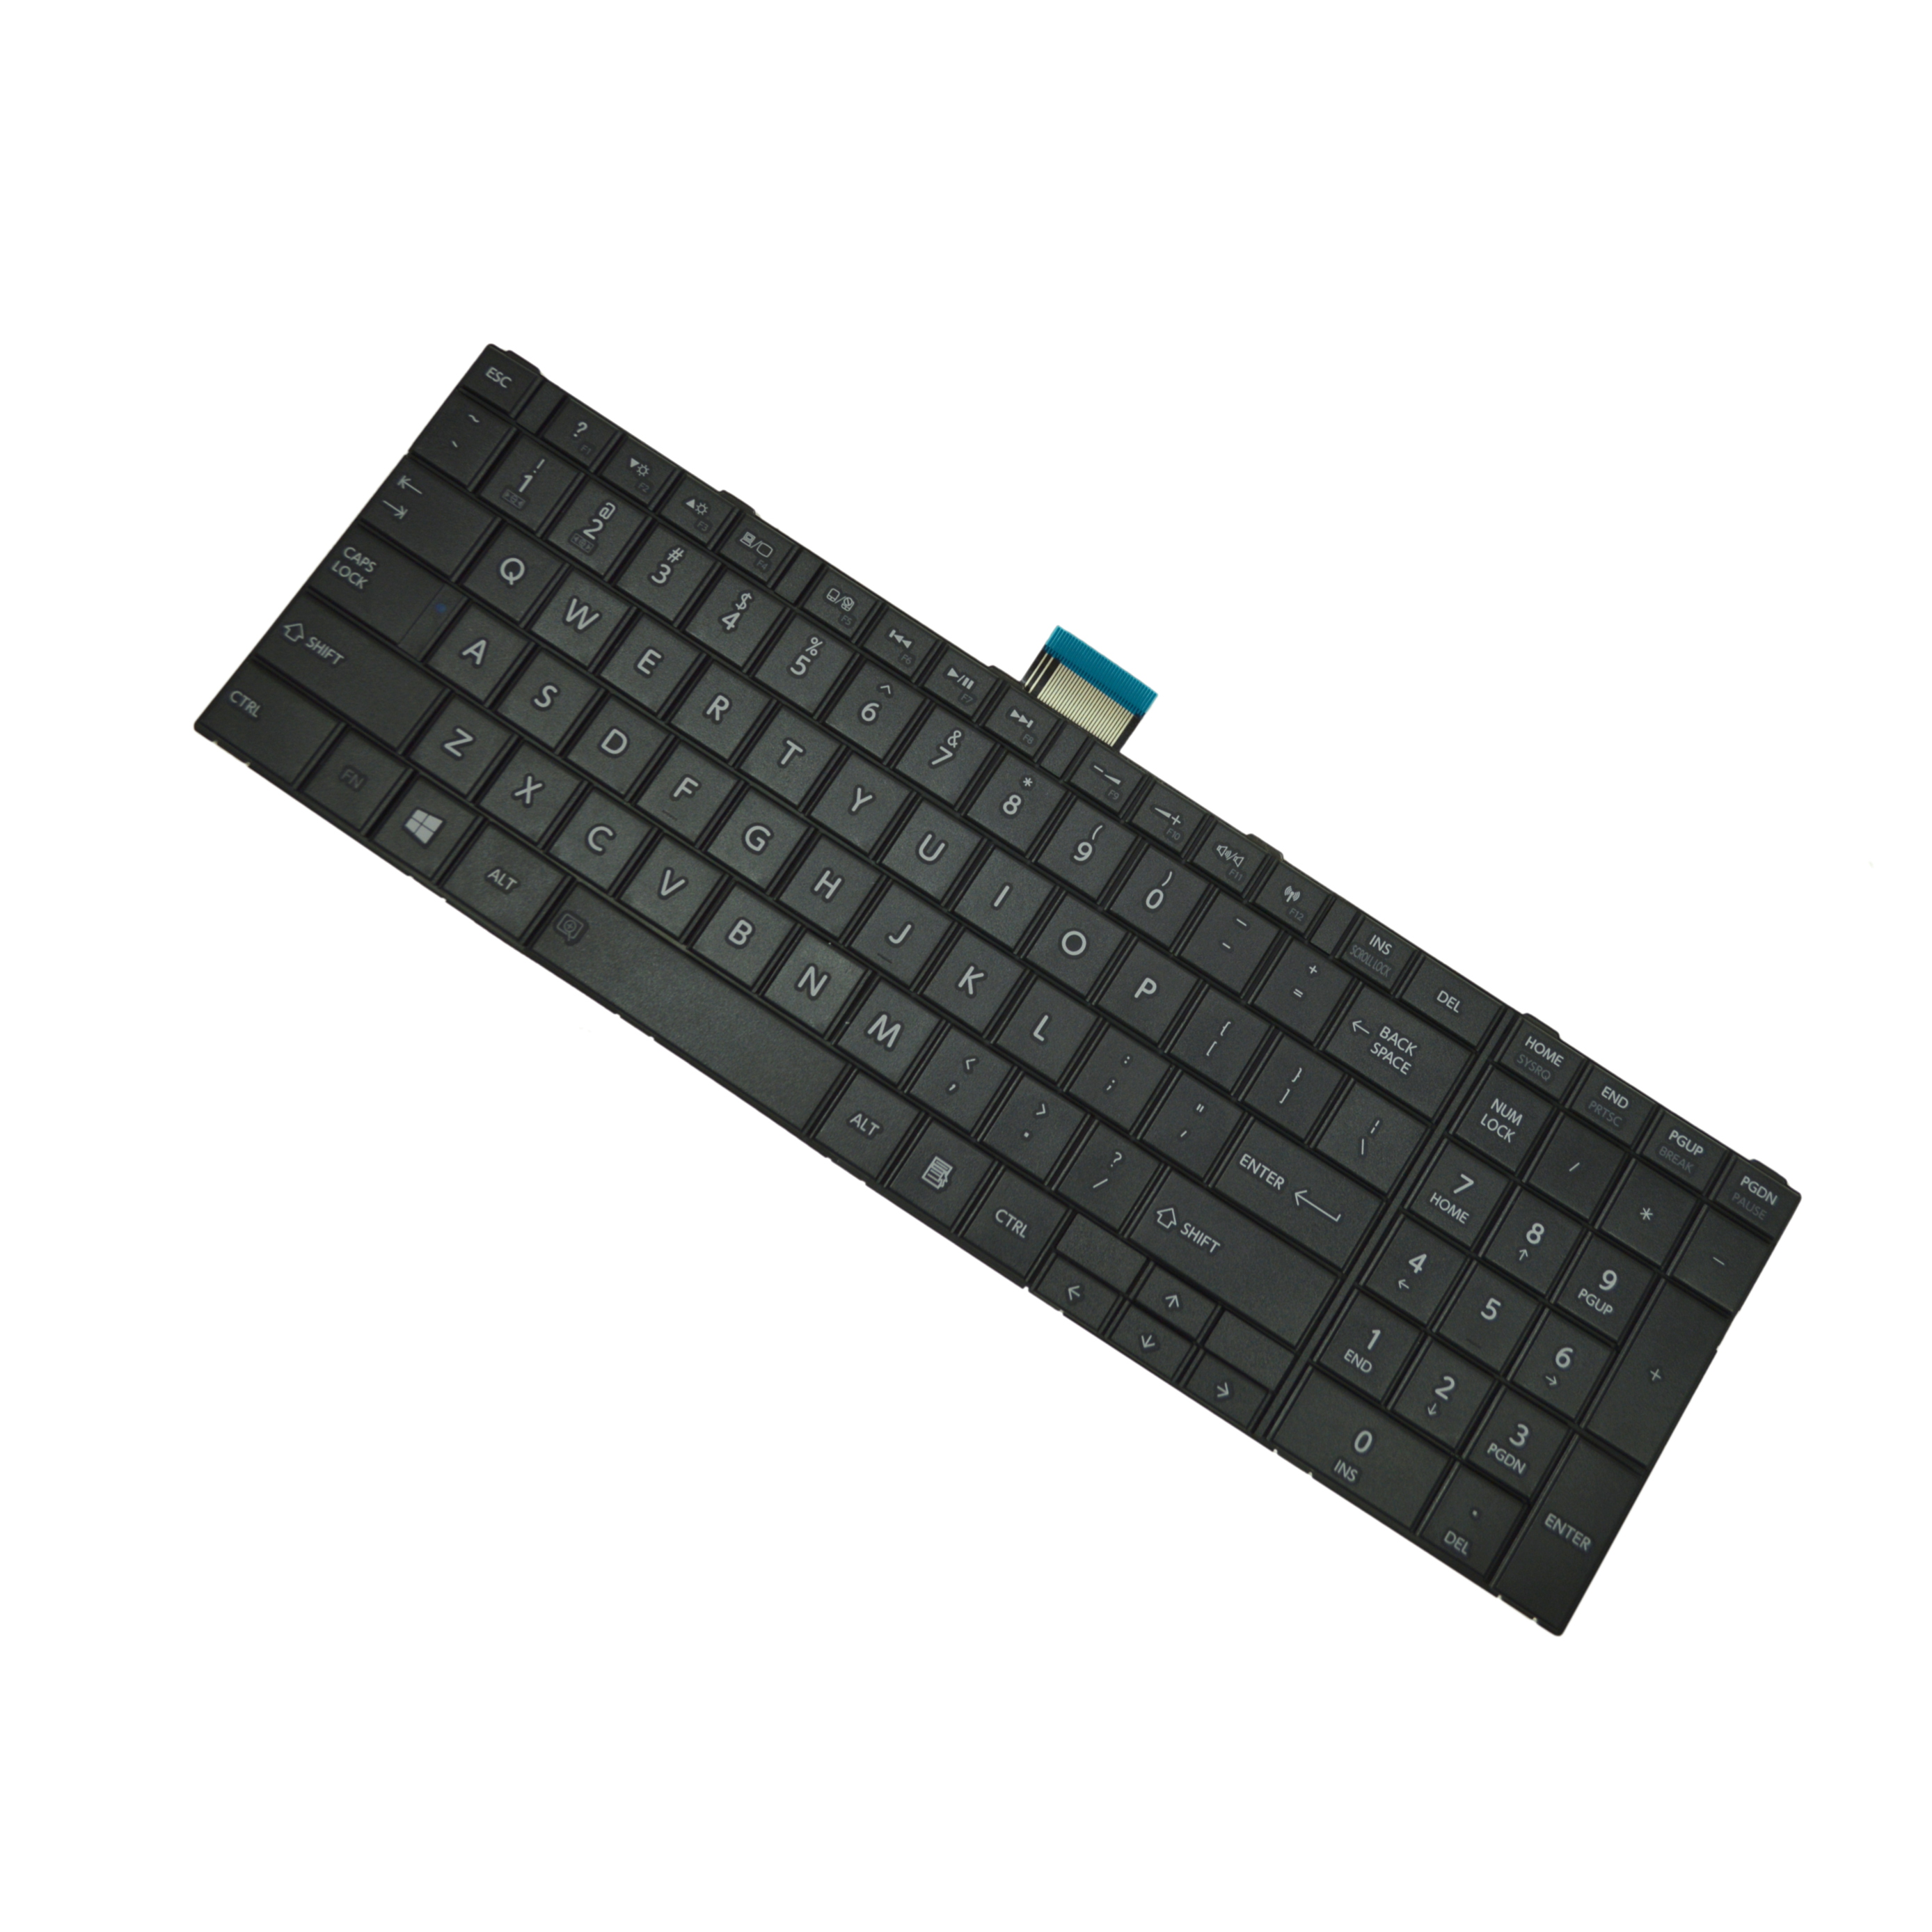 HQRP Laptop Keyboard for Toshiba Satellite C875D-S7105 / C875D-S7120 / C875D-S7220 / C875D-S7222 / C875D-S7223 Notebook plus HQRP Coaster